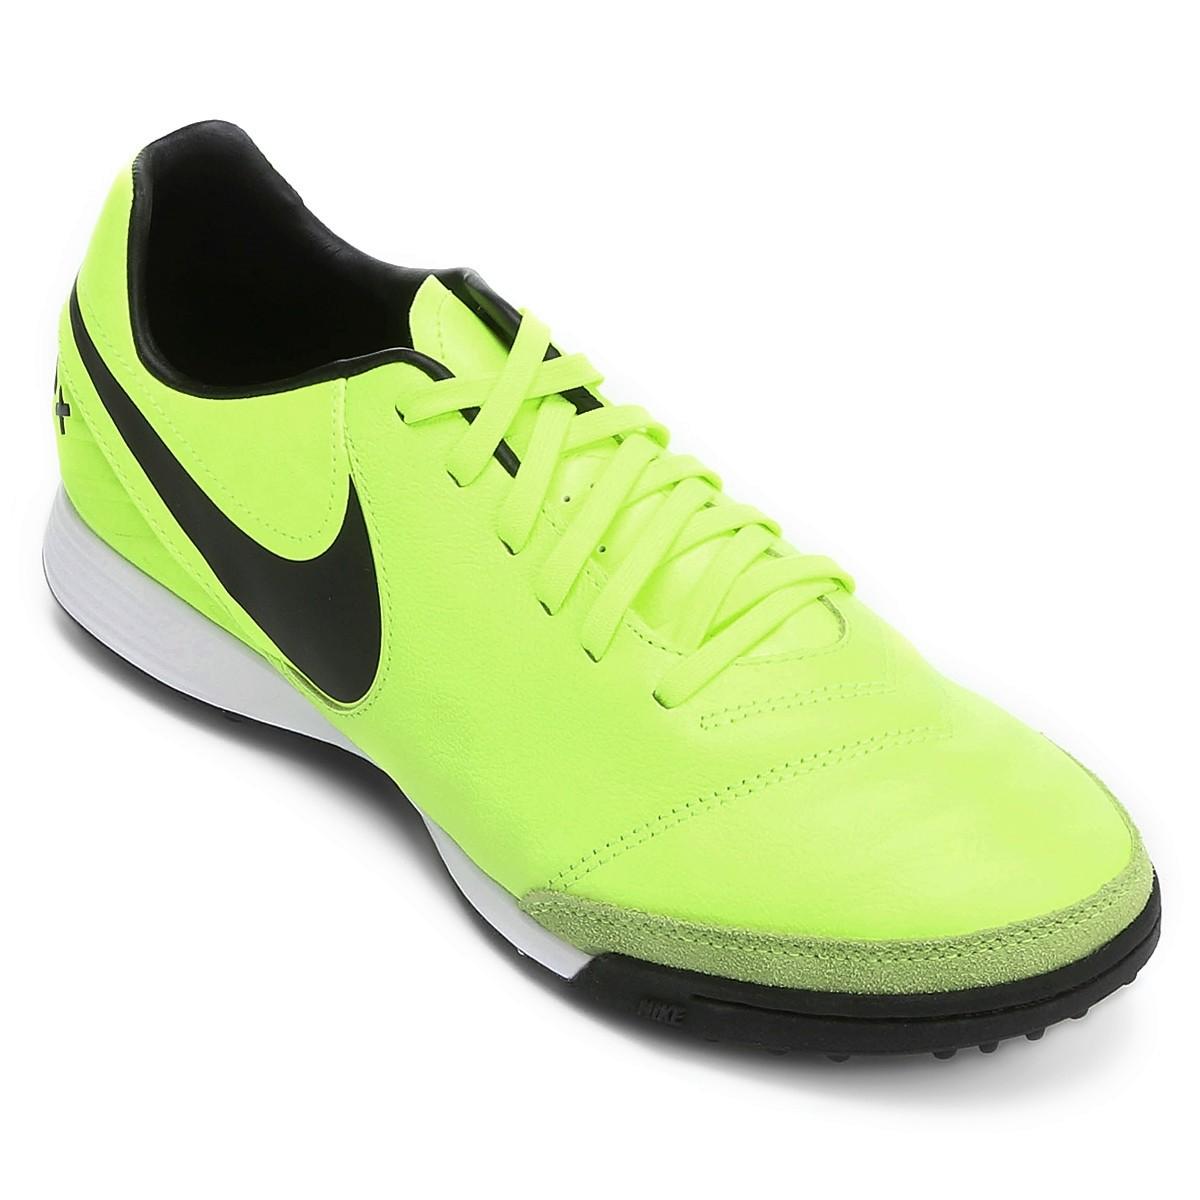 7812ec84f8 Chuteira F7 Nike Tiempo Mystic V TF 819224-707 - Verde - Botas ...